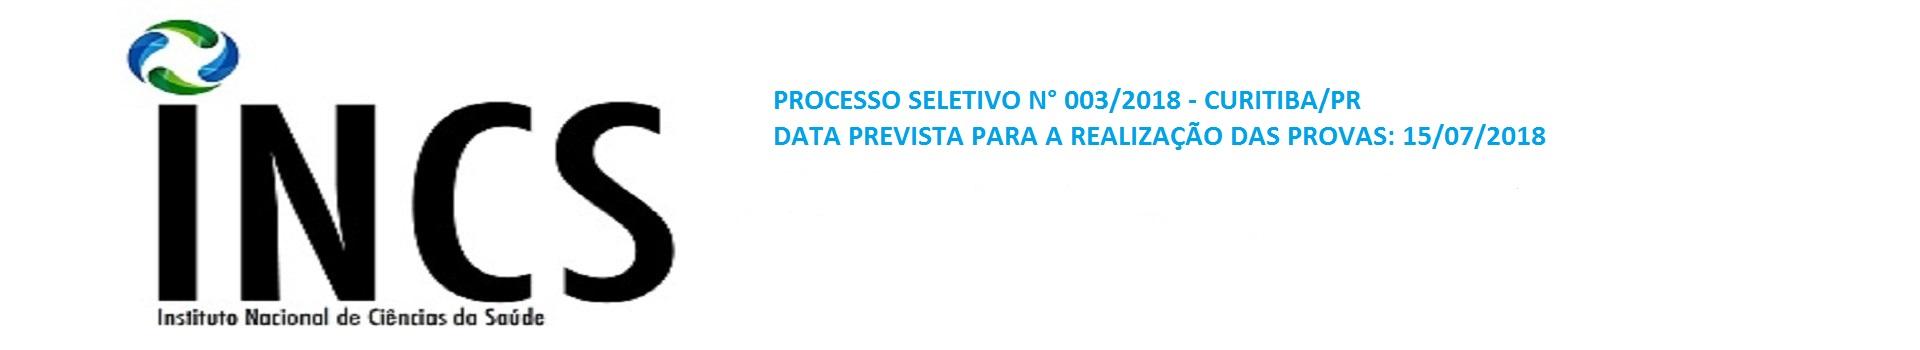 INCS - PS N° 003/2018 - EDITAL DE ABERTURA DO PROCESSO SELETIVO